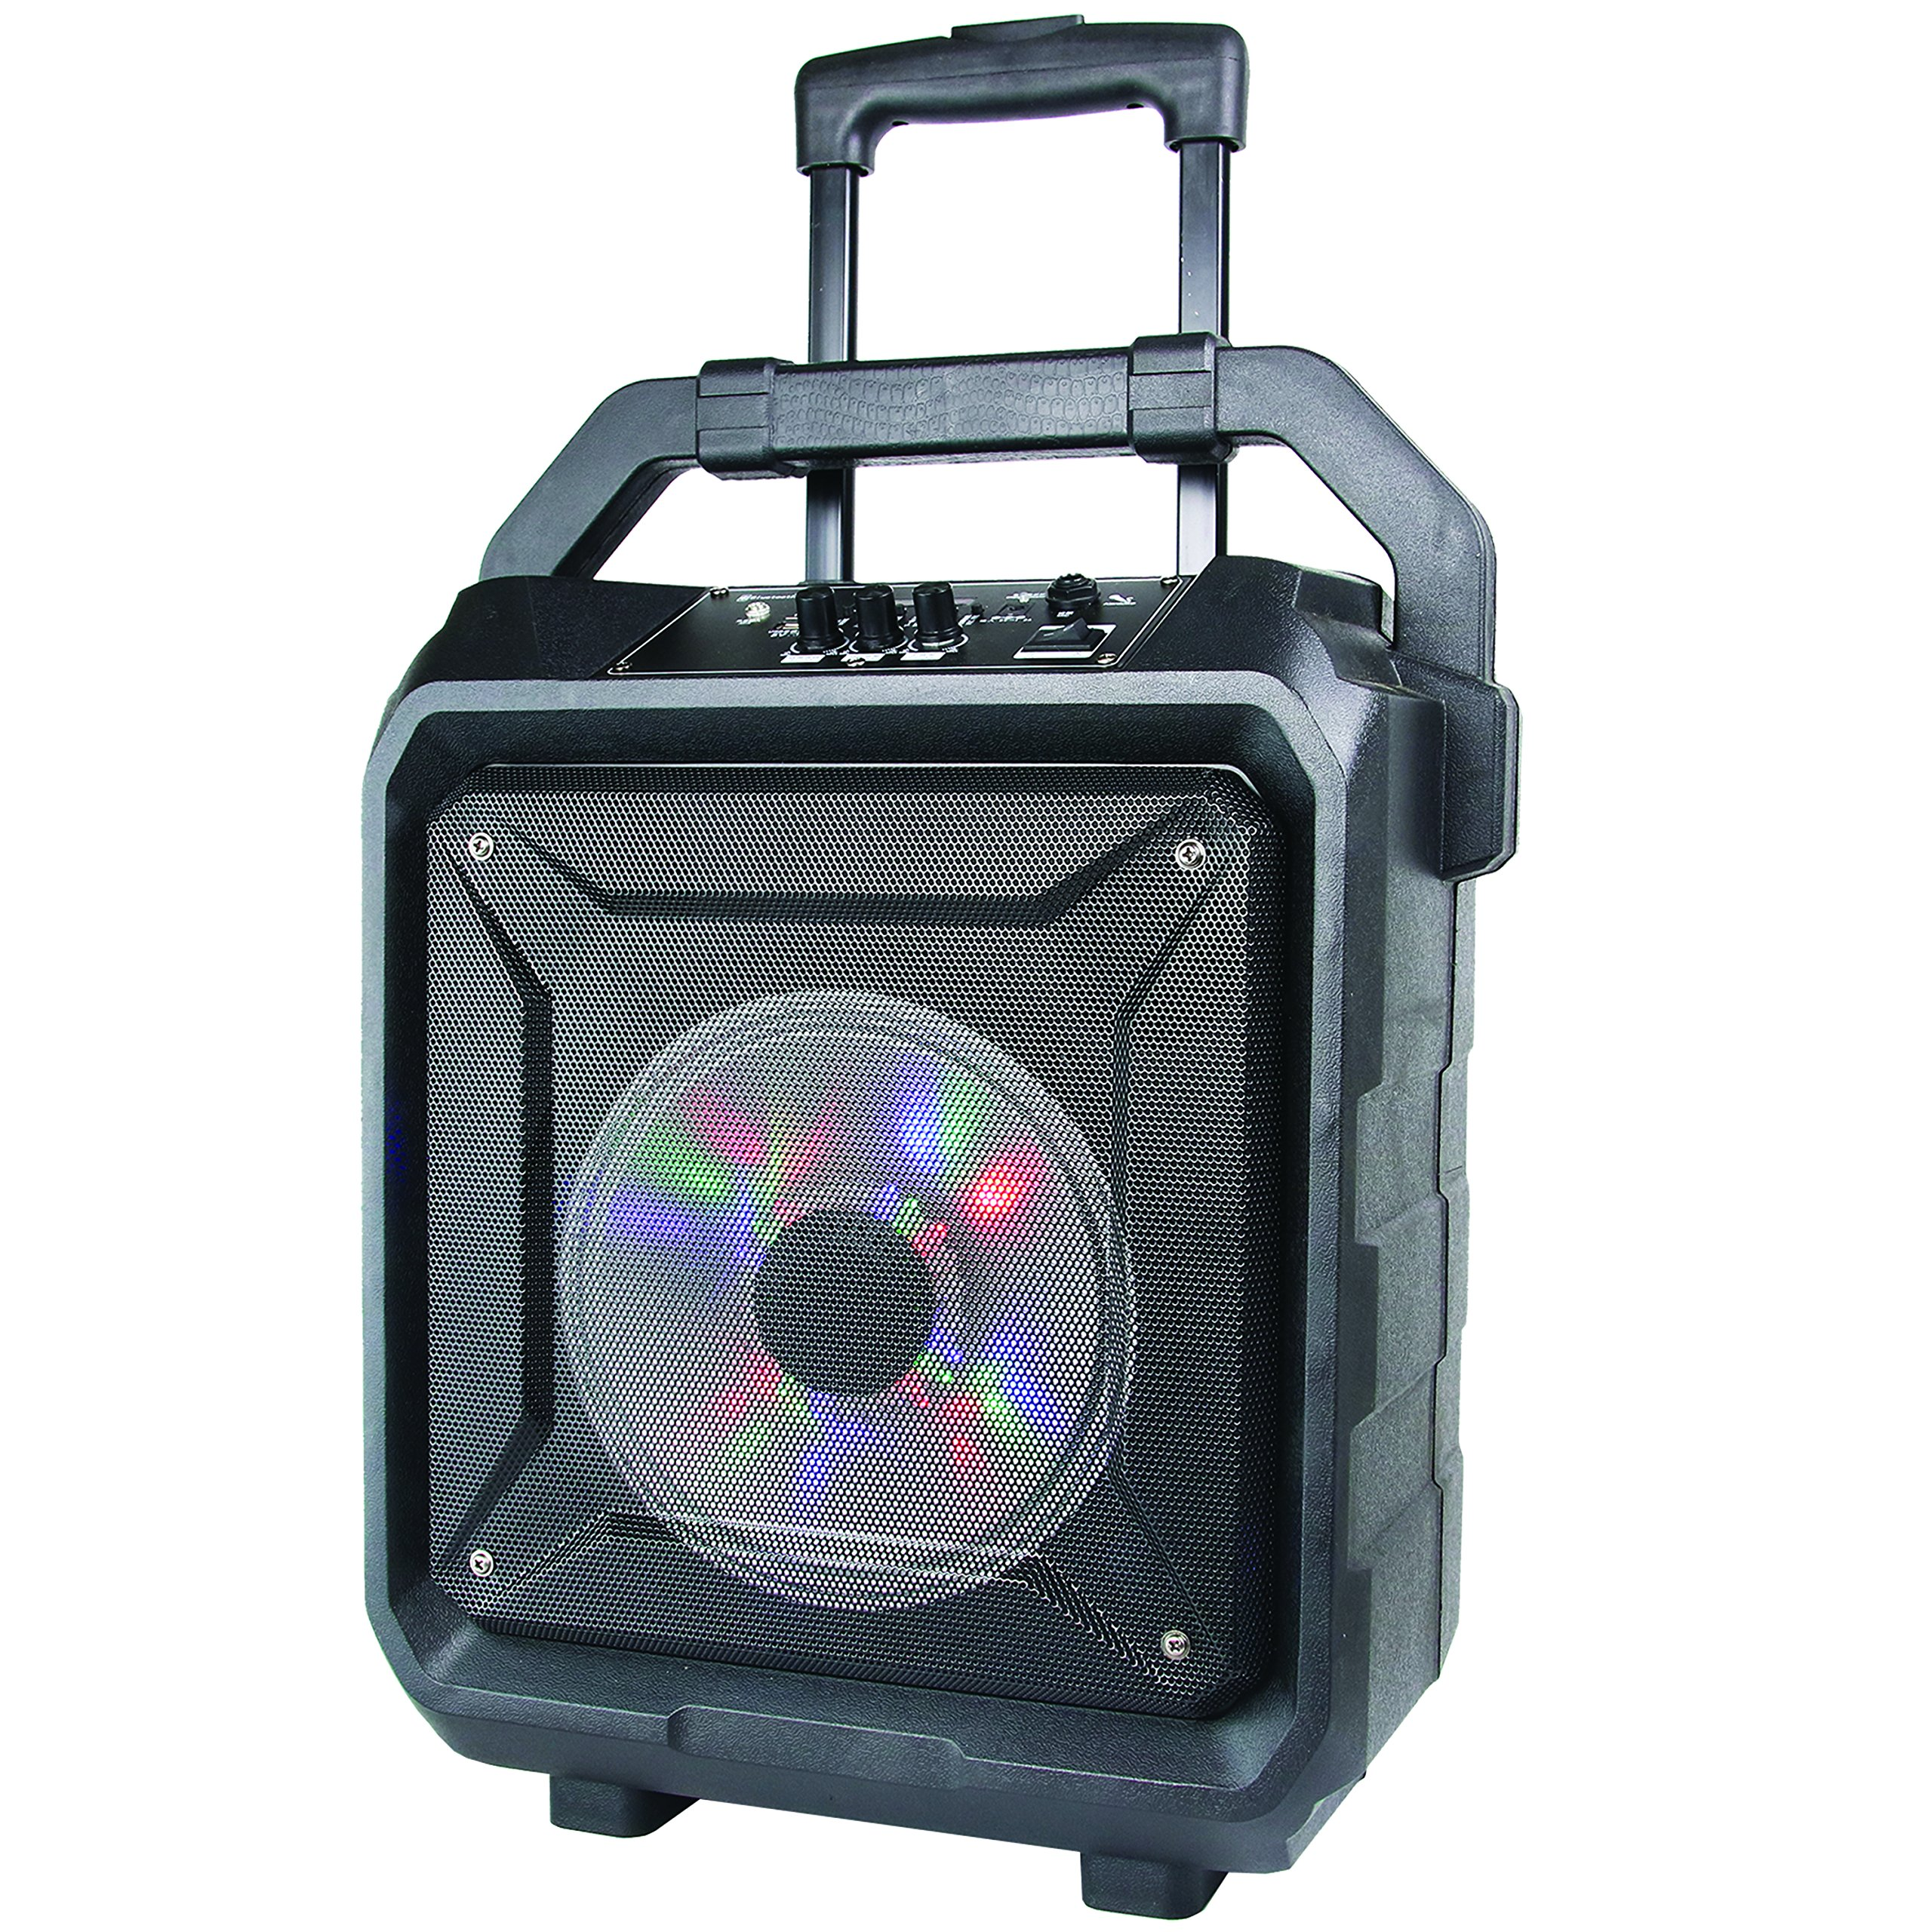 SuperSonic Tailgate Bluetooth Speaker 8-Inch, Black (IQ-5508DJBT)